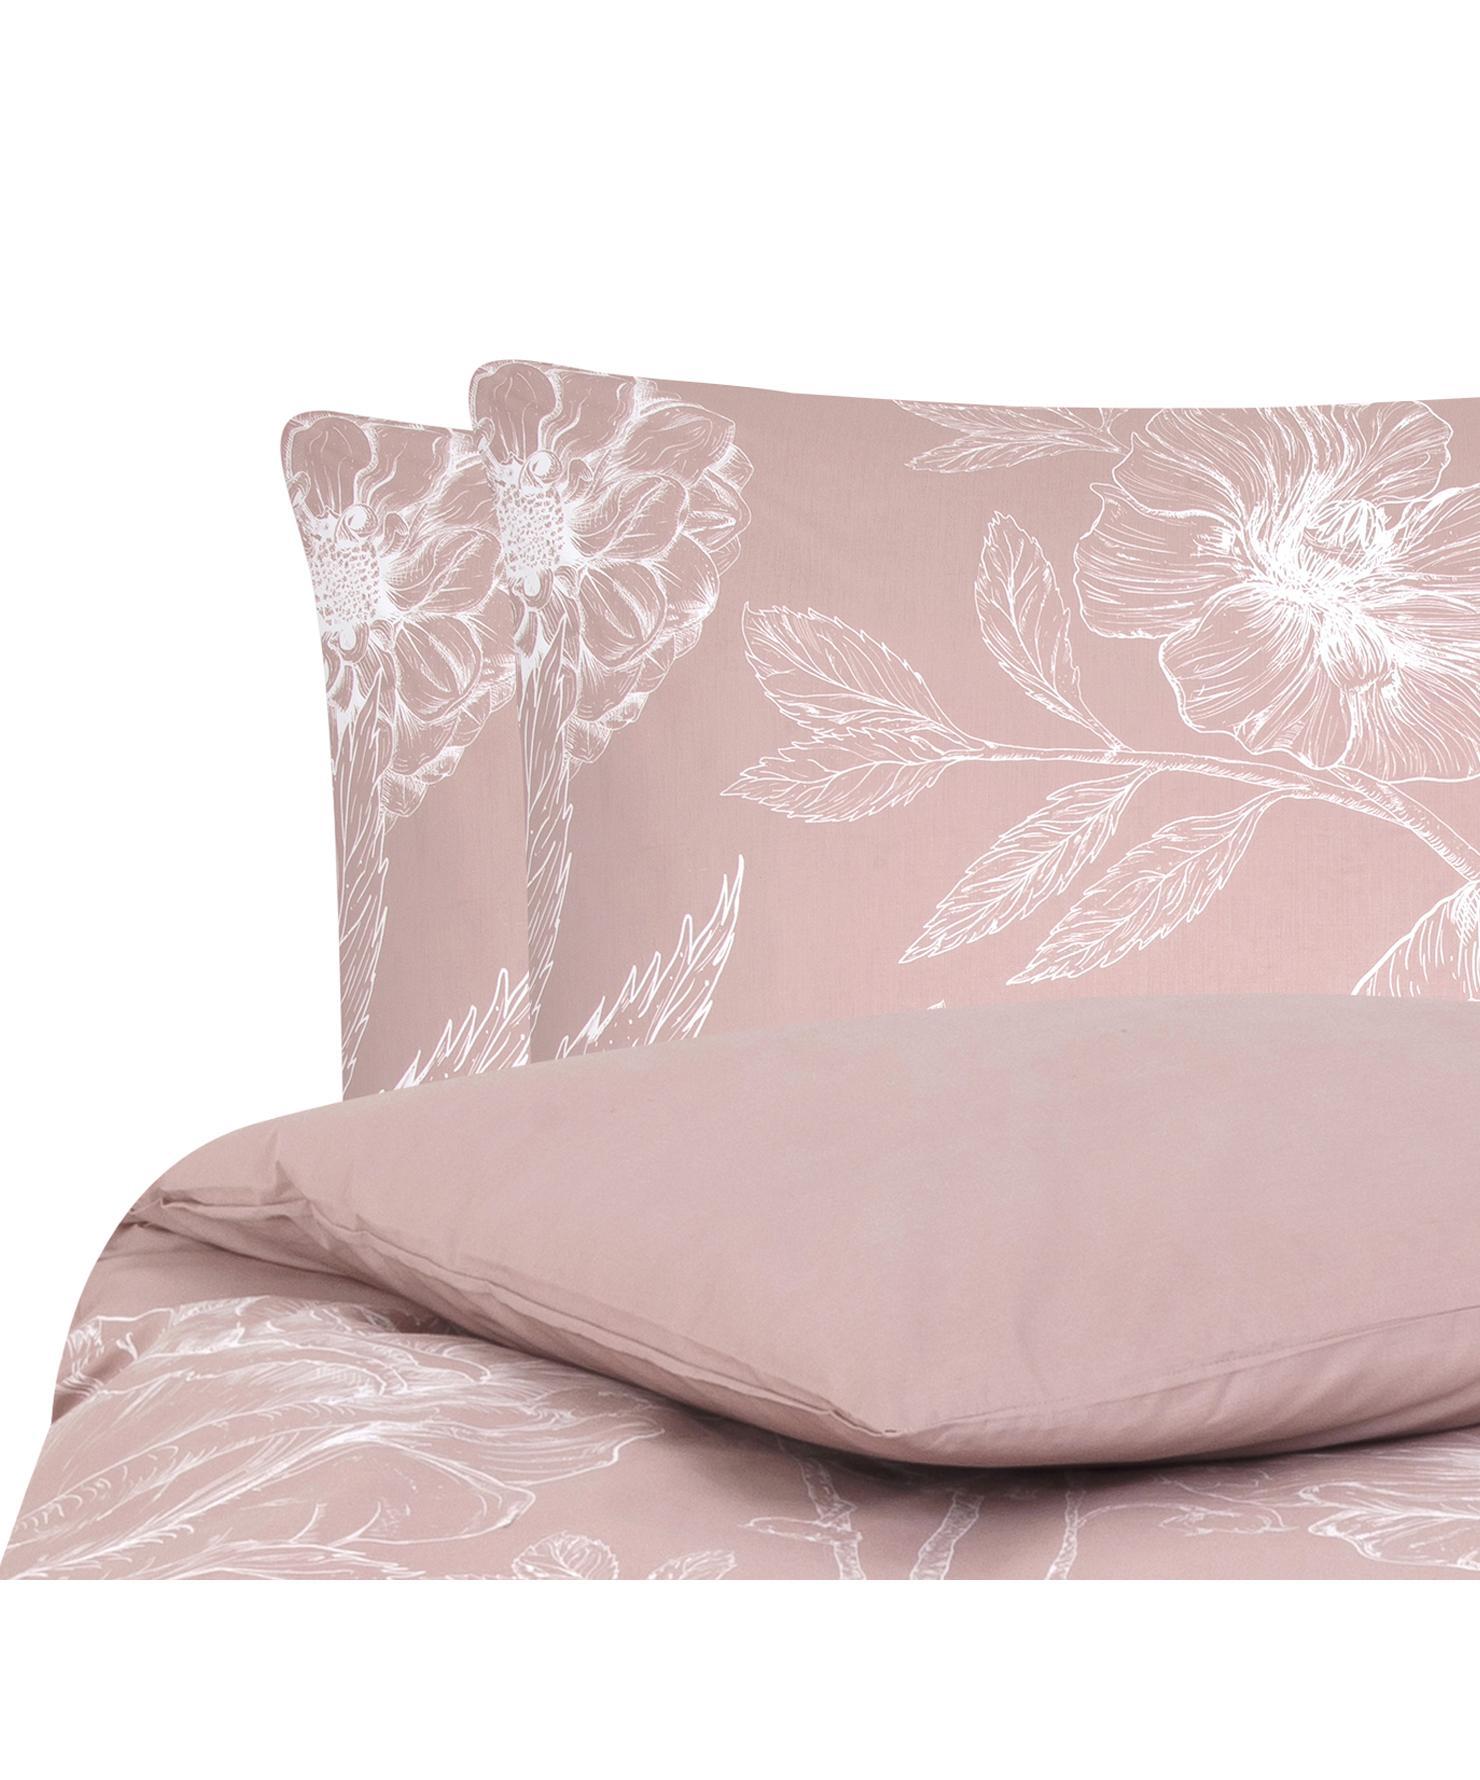 Baumwollperkal-Bettwäsche Keno mit Blumenprint, Webart: Perkal Fadendichte 180 TC, Altrosa, Weiß, 200 x 200 cm + 2 Kissen 80 x 80 cm